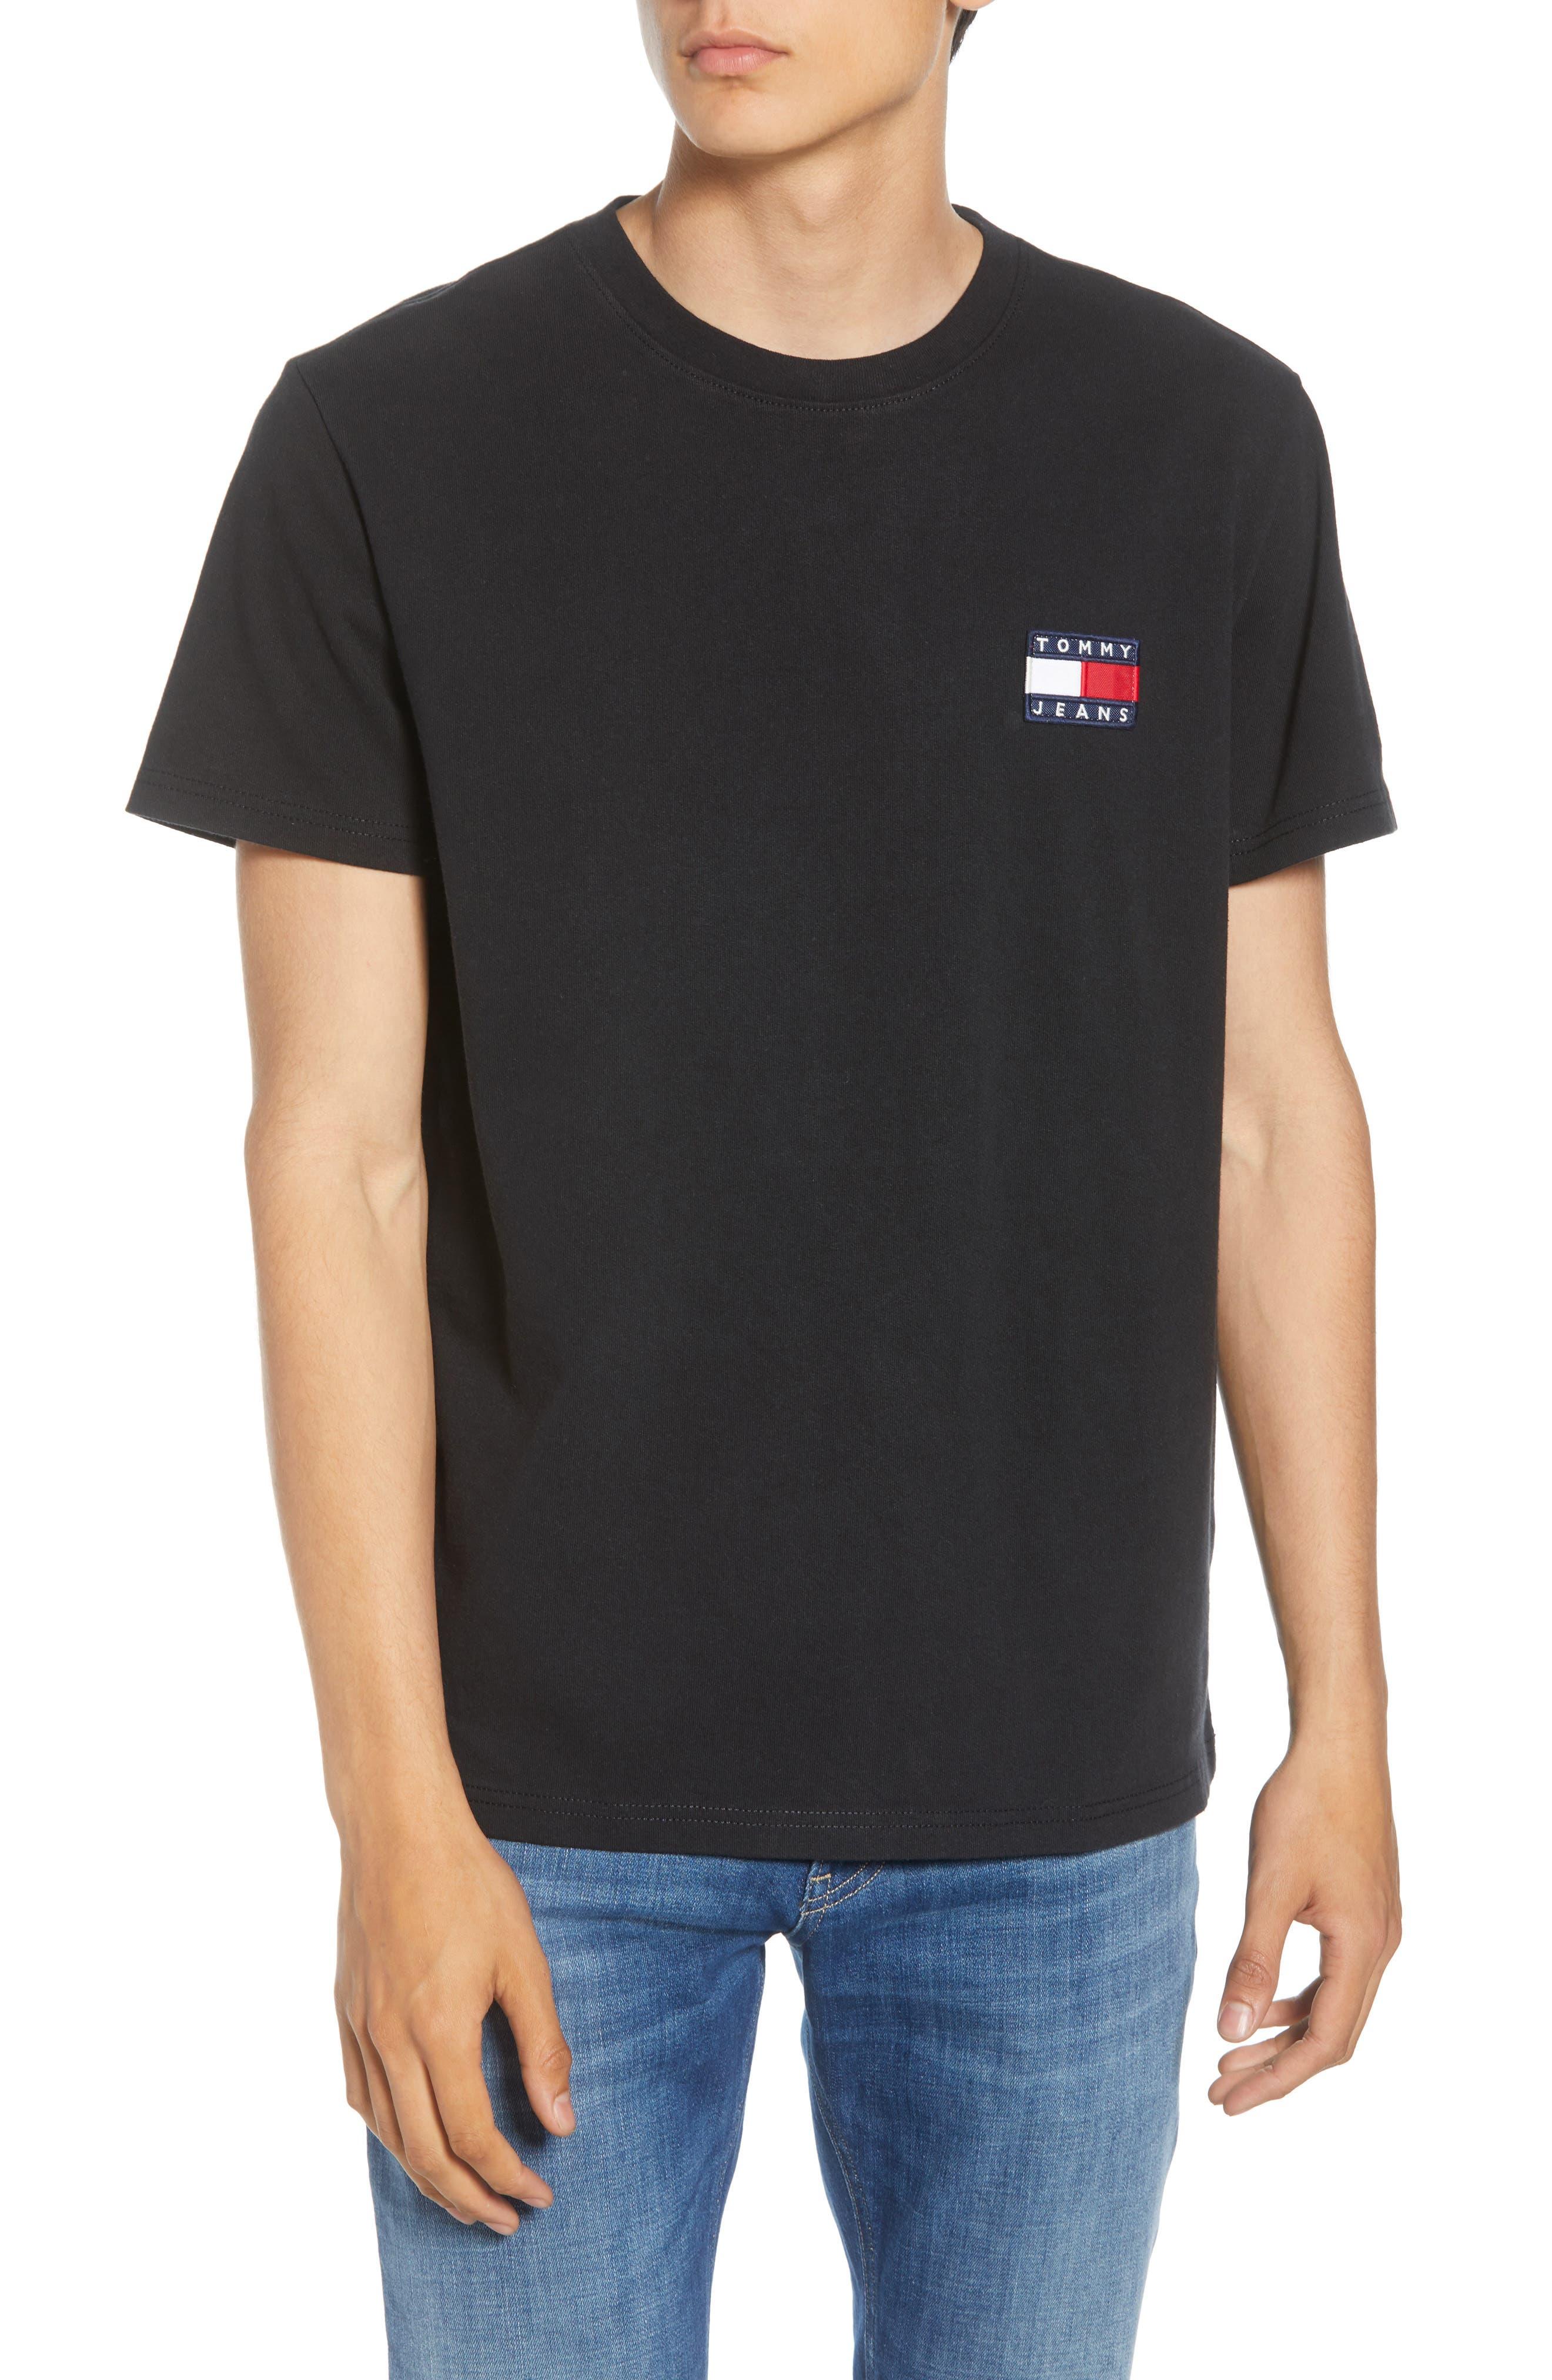 b2402edfe72 TOMMY JEANS Urban Clothing, Urban Wear | Nordstrom